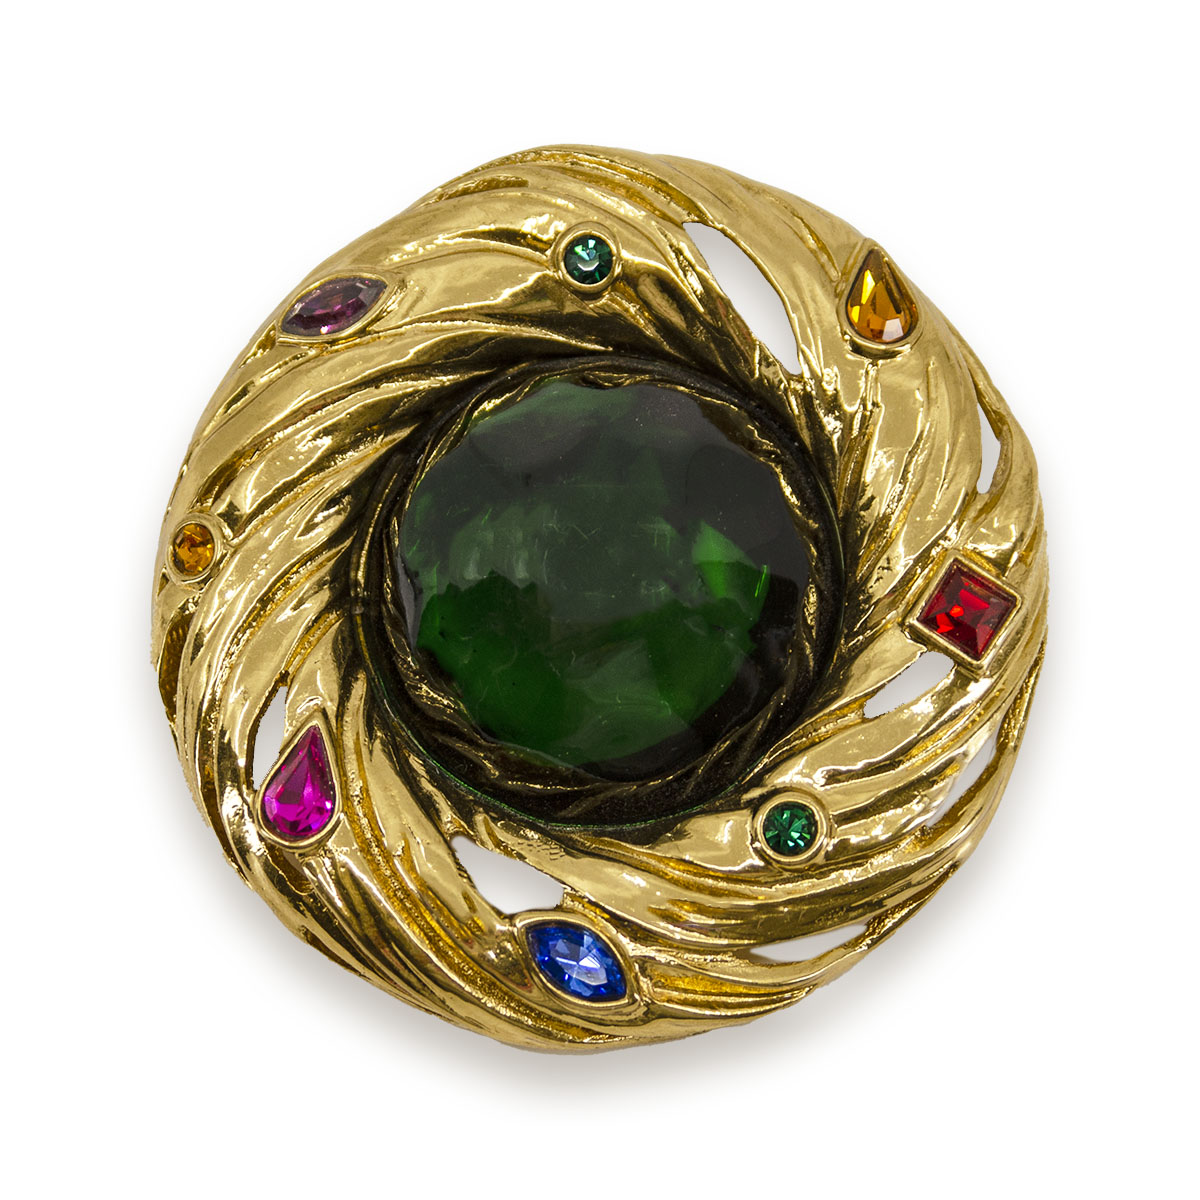 ysl swirl brooch pendant